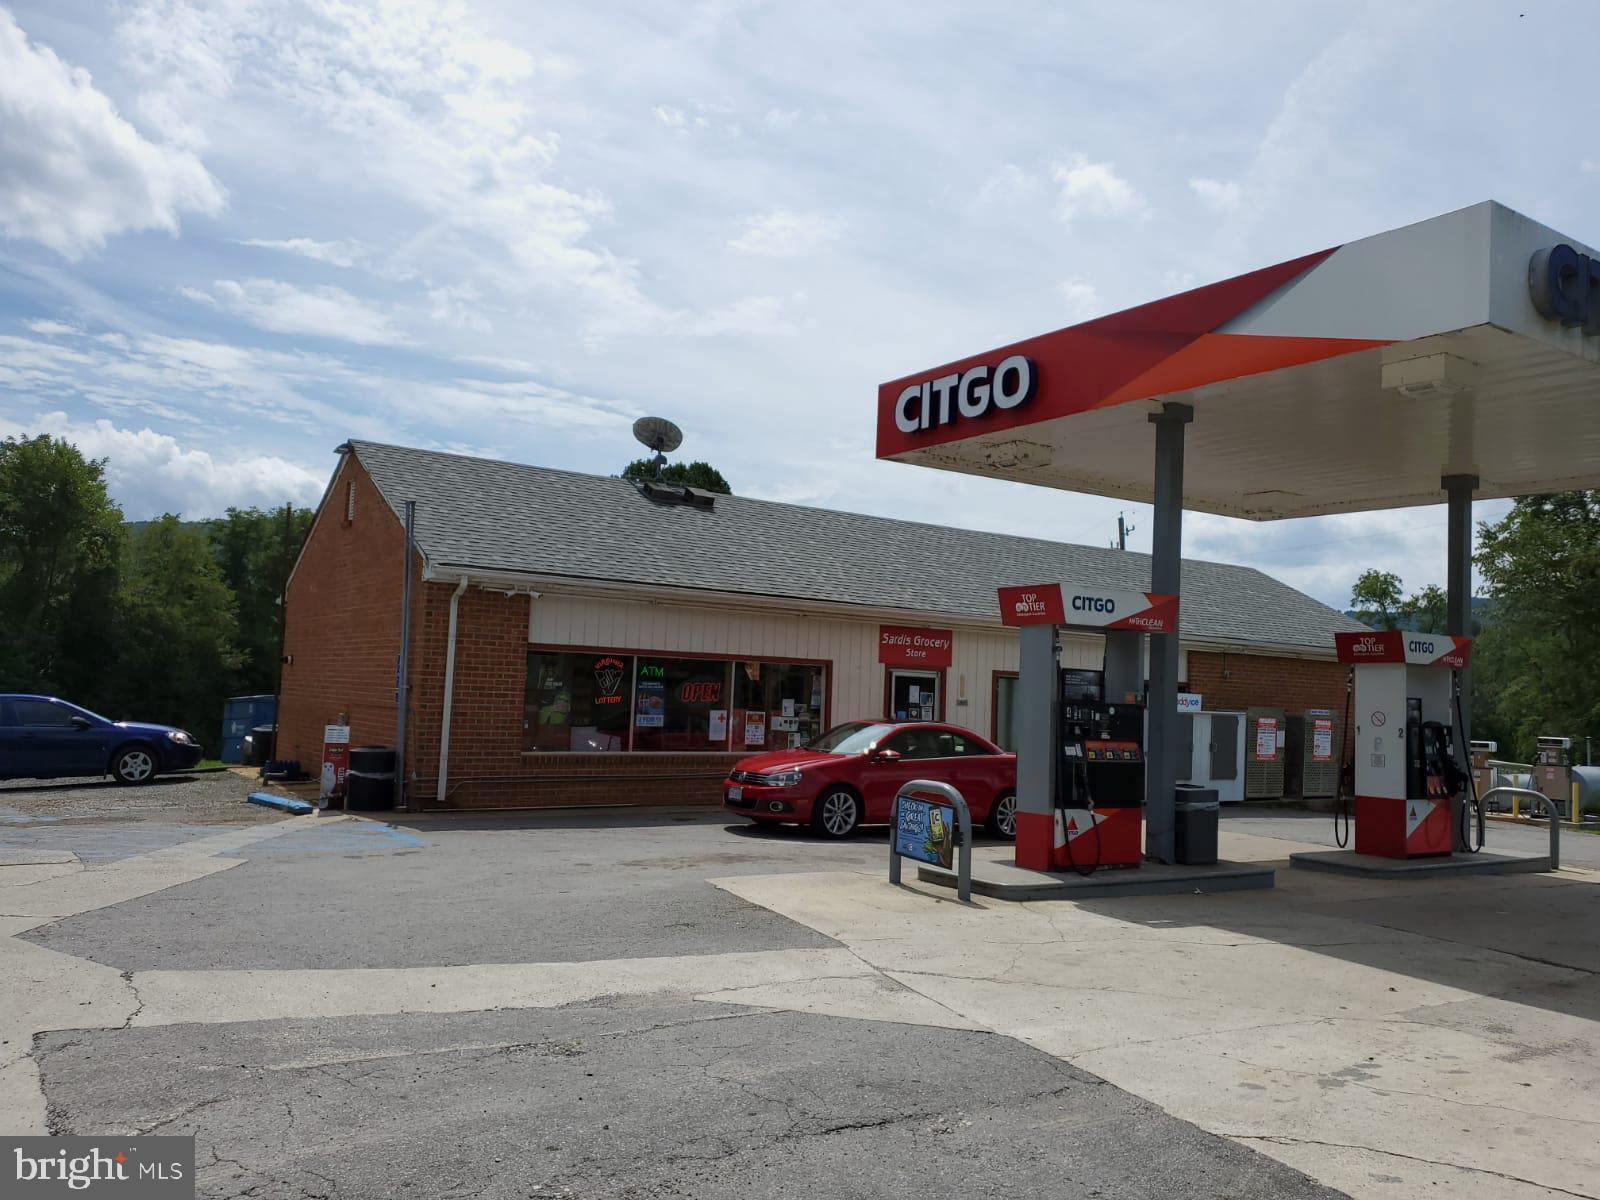 1869 Lexington Tpke, Amherst, VA, 24521